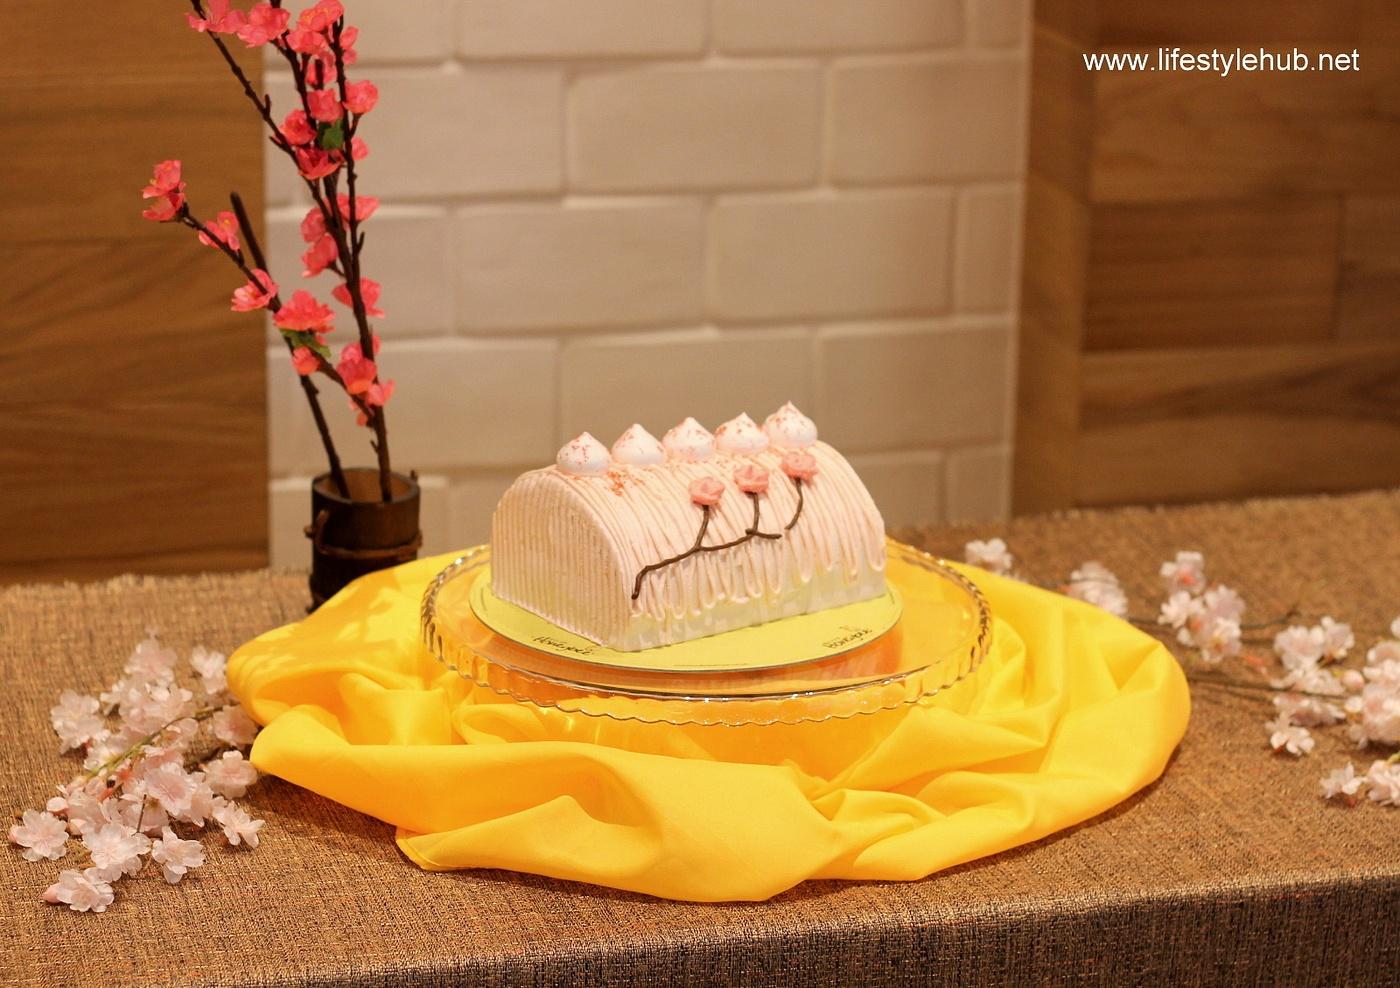 honeybon cakes